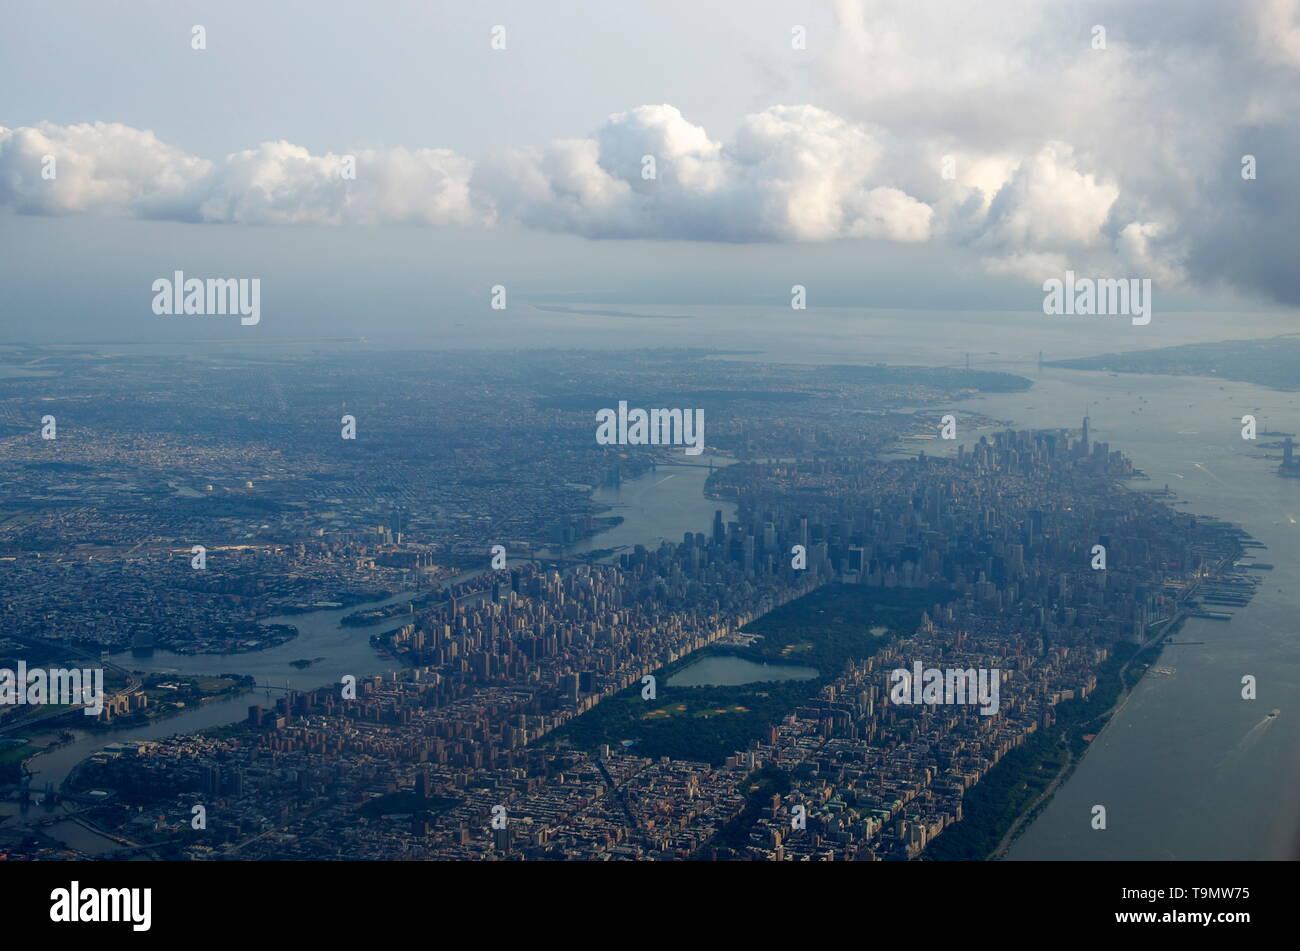 aerial view of Manhattan, New York City Stock Photo